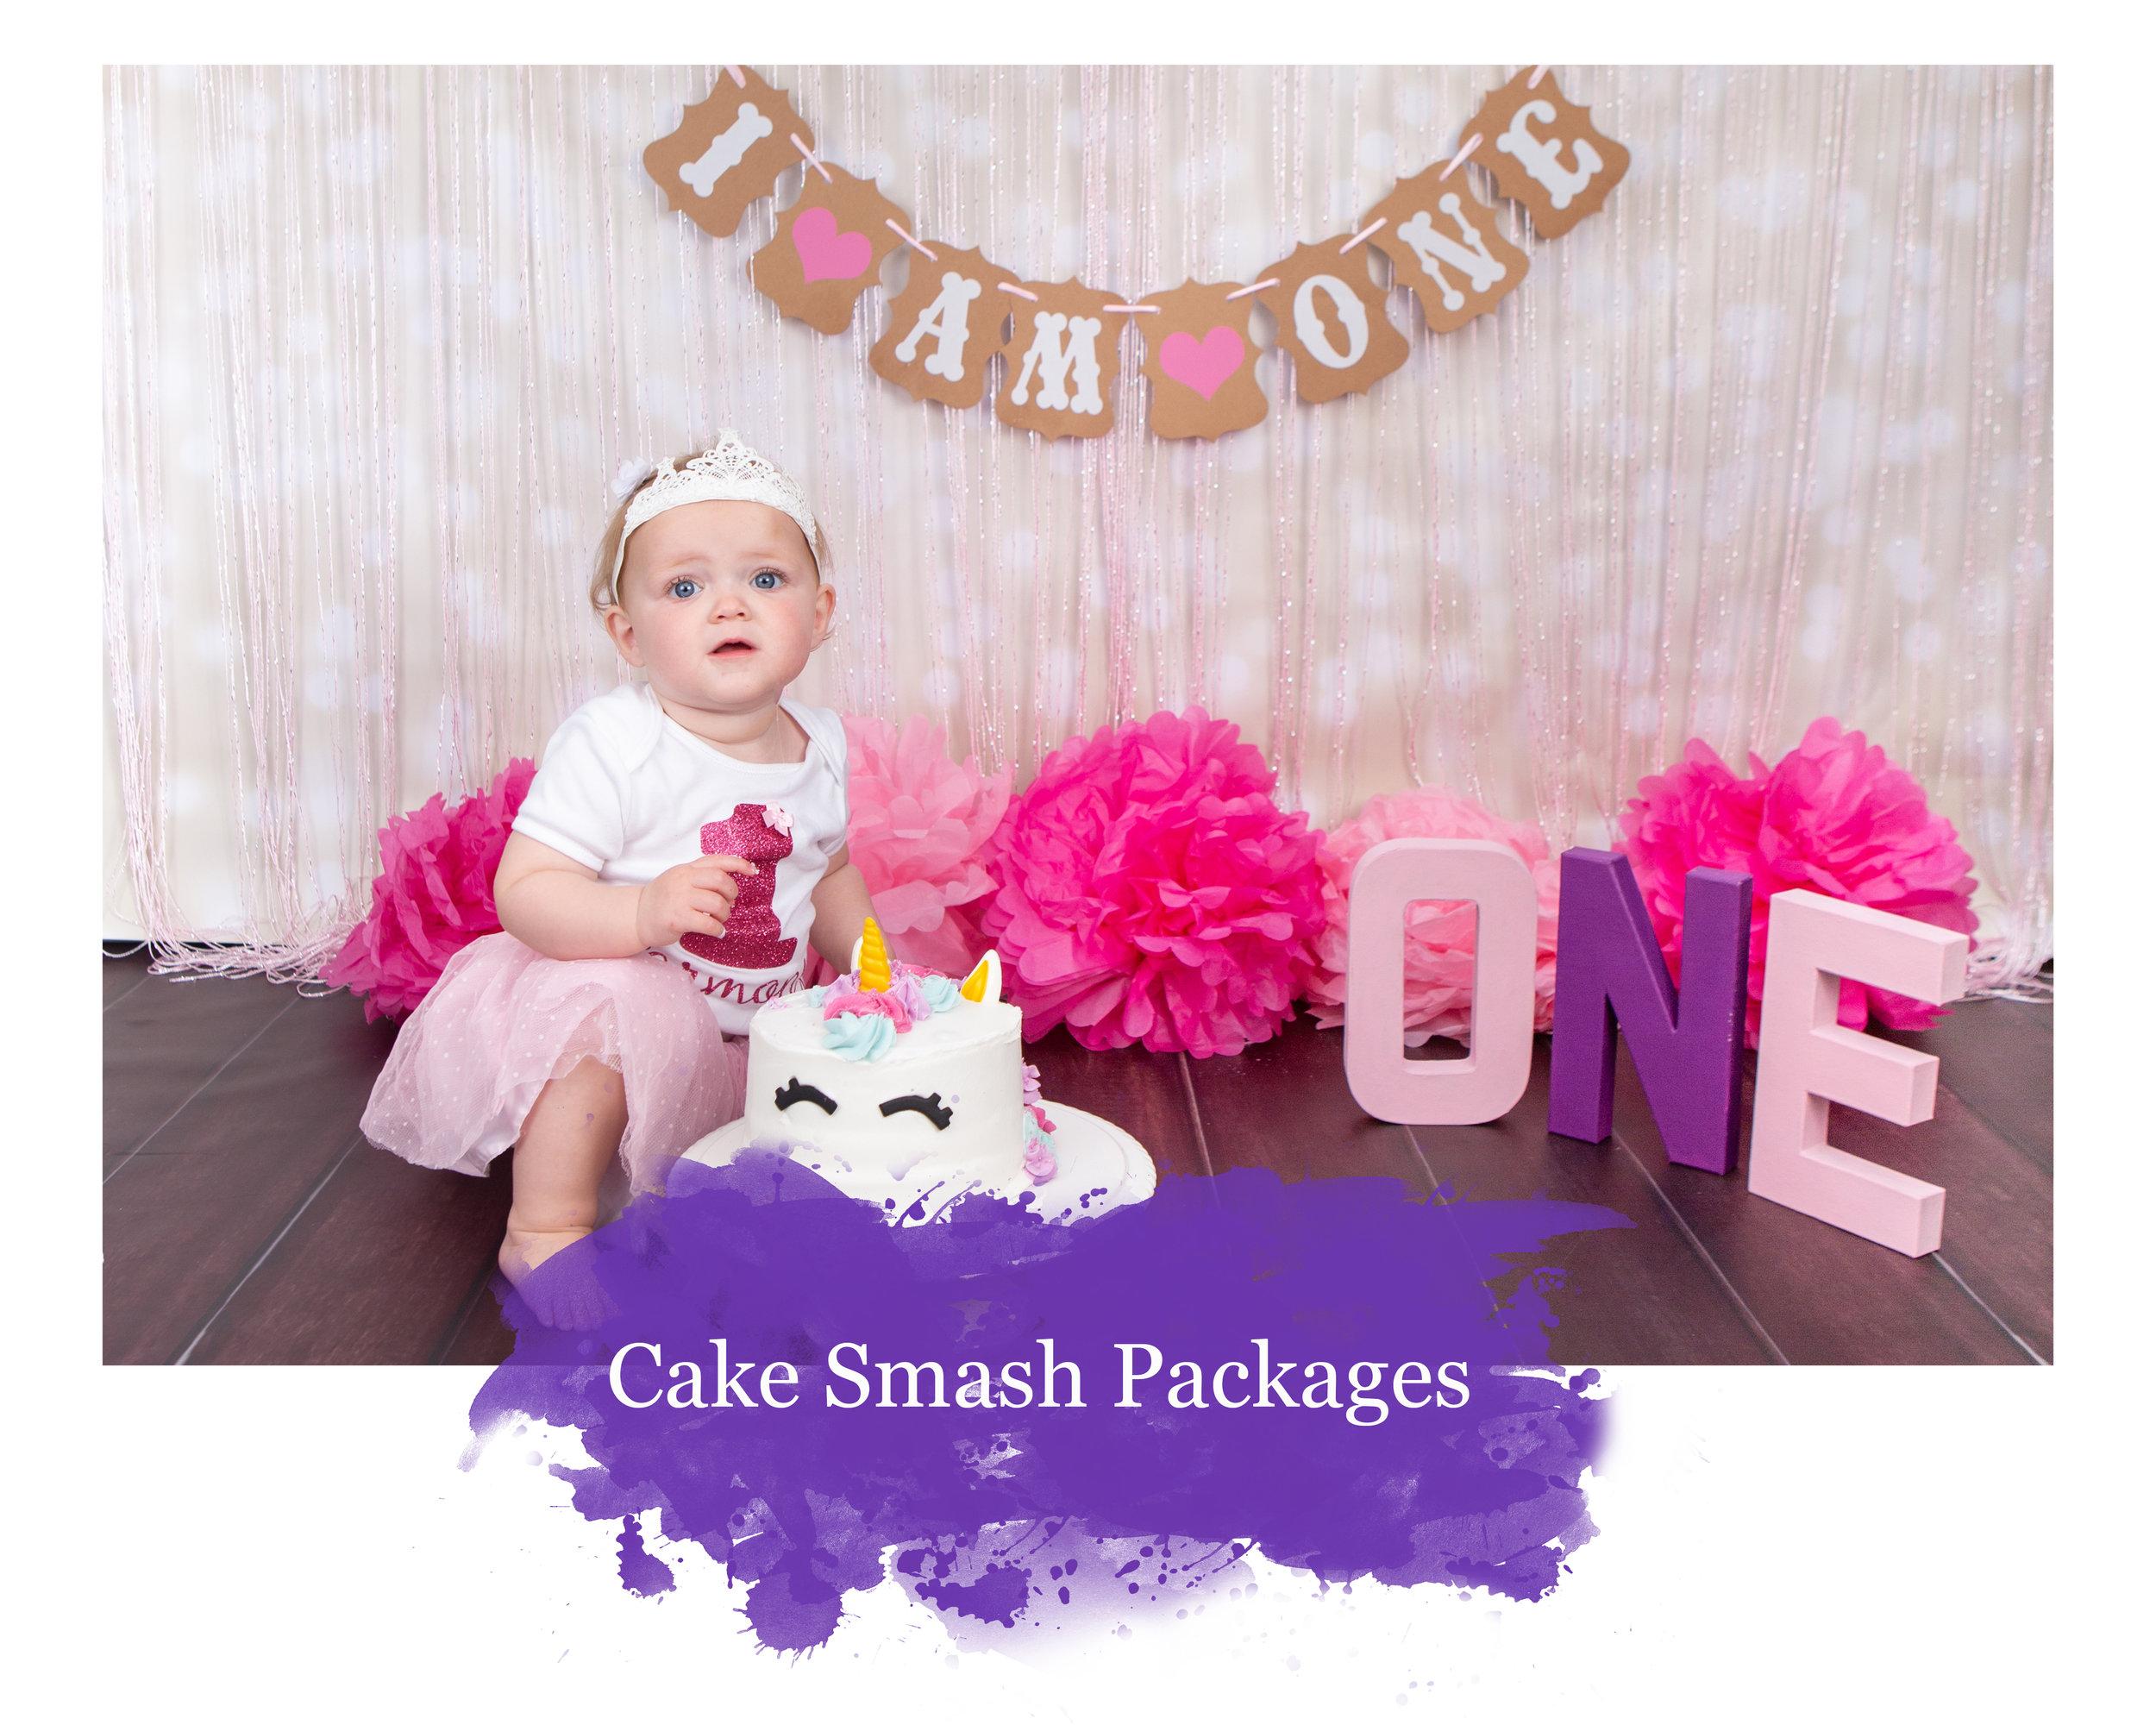 cake smash packages.jpg